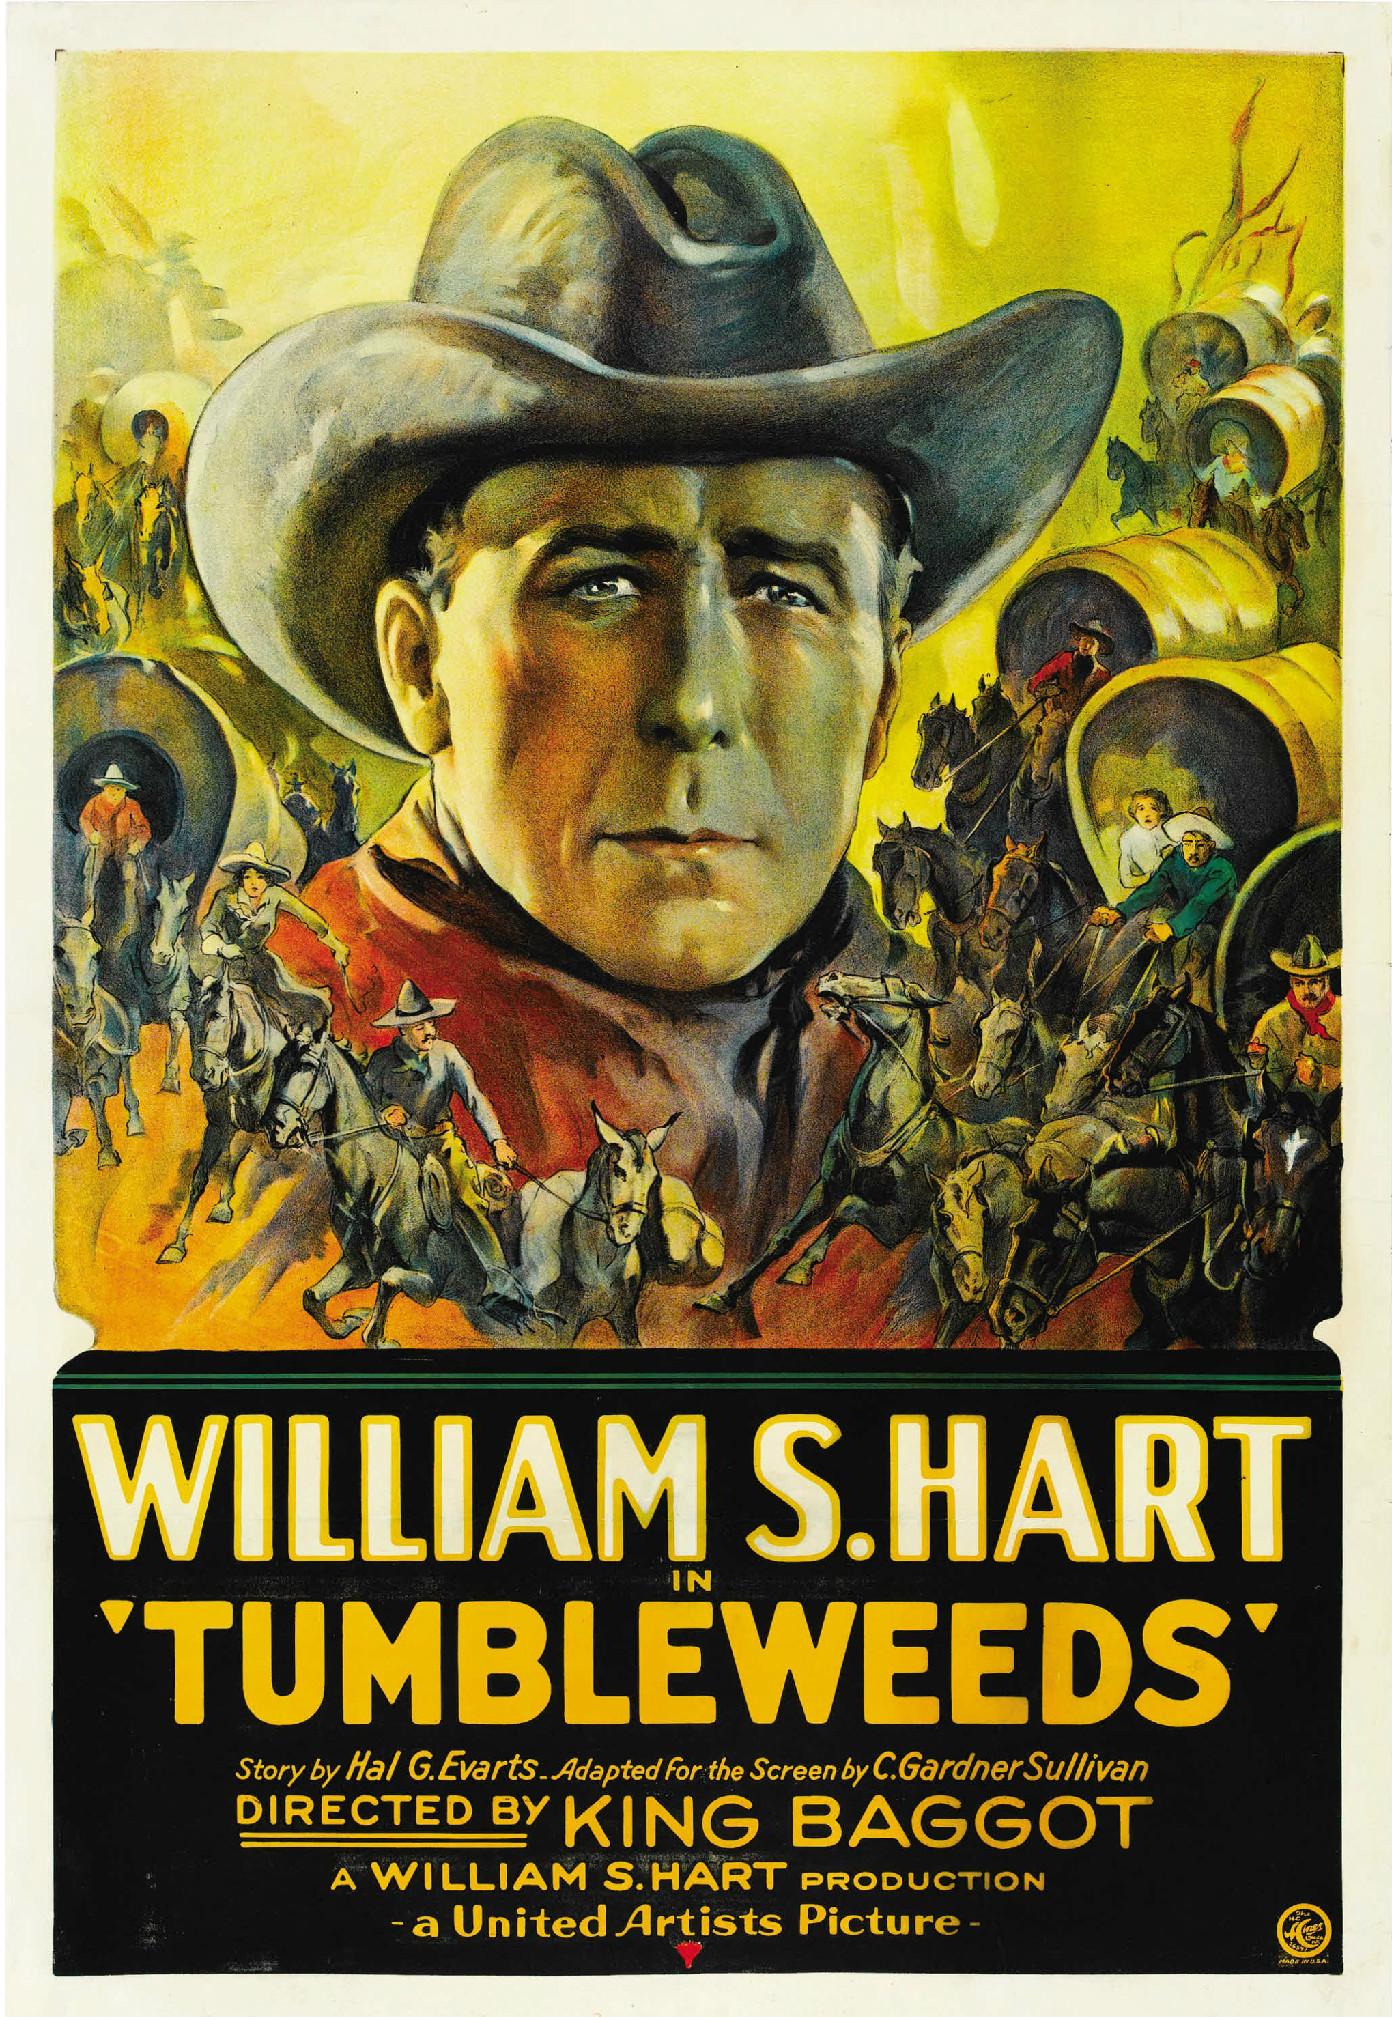 Tumbleweeds, 1925 western starring William S. Hart ...